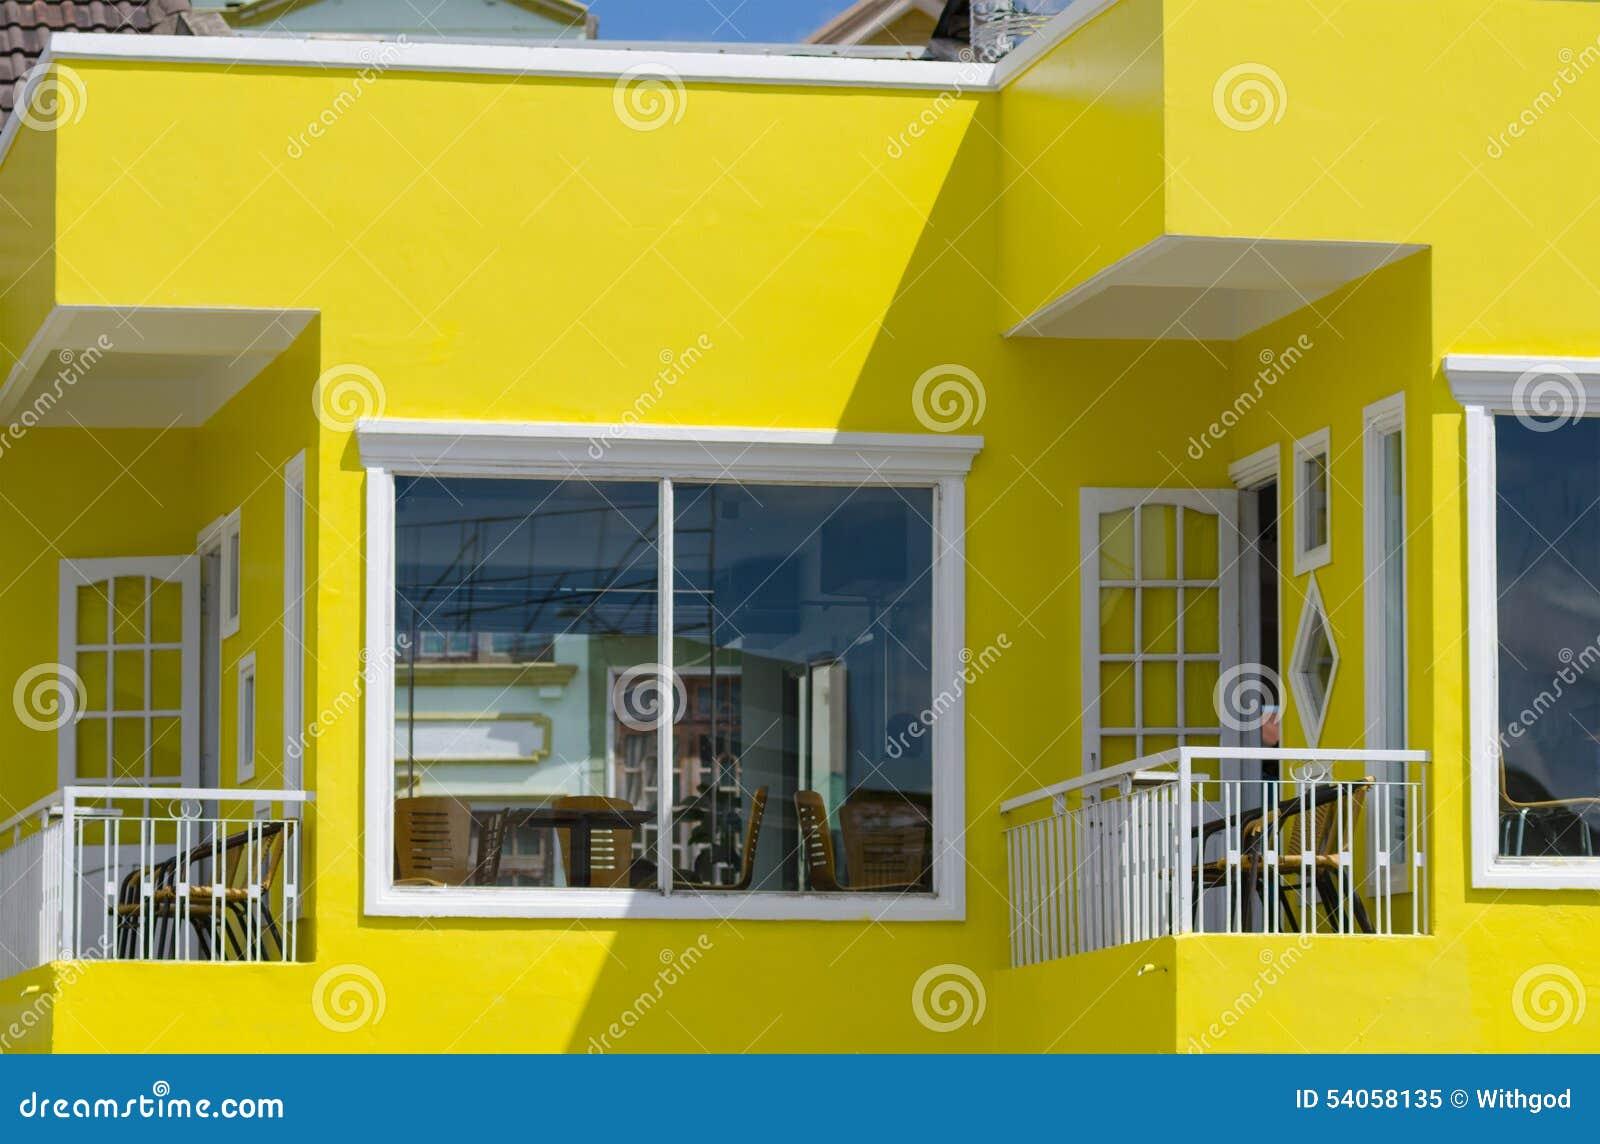 Yellow house with balconies stock image image of for Casas pintadas por dentro